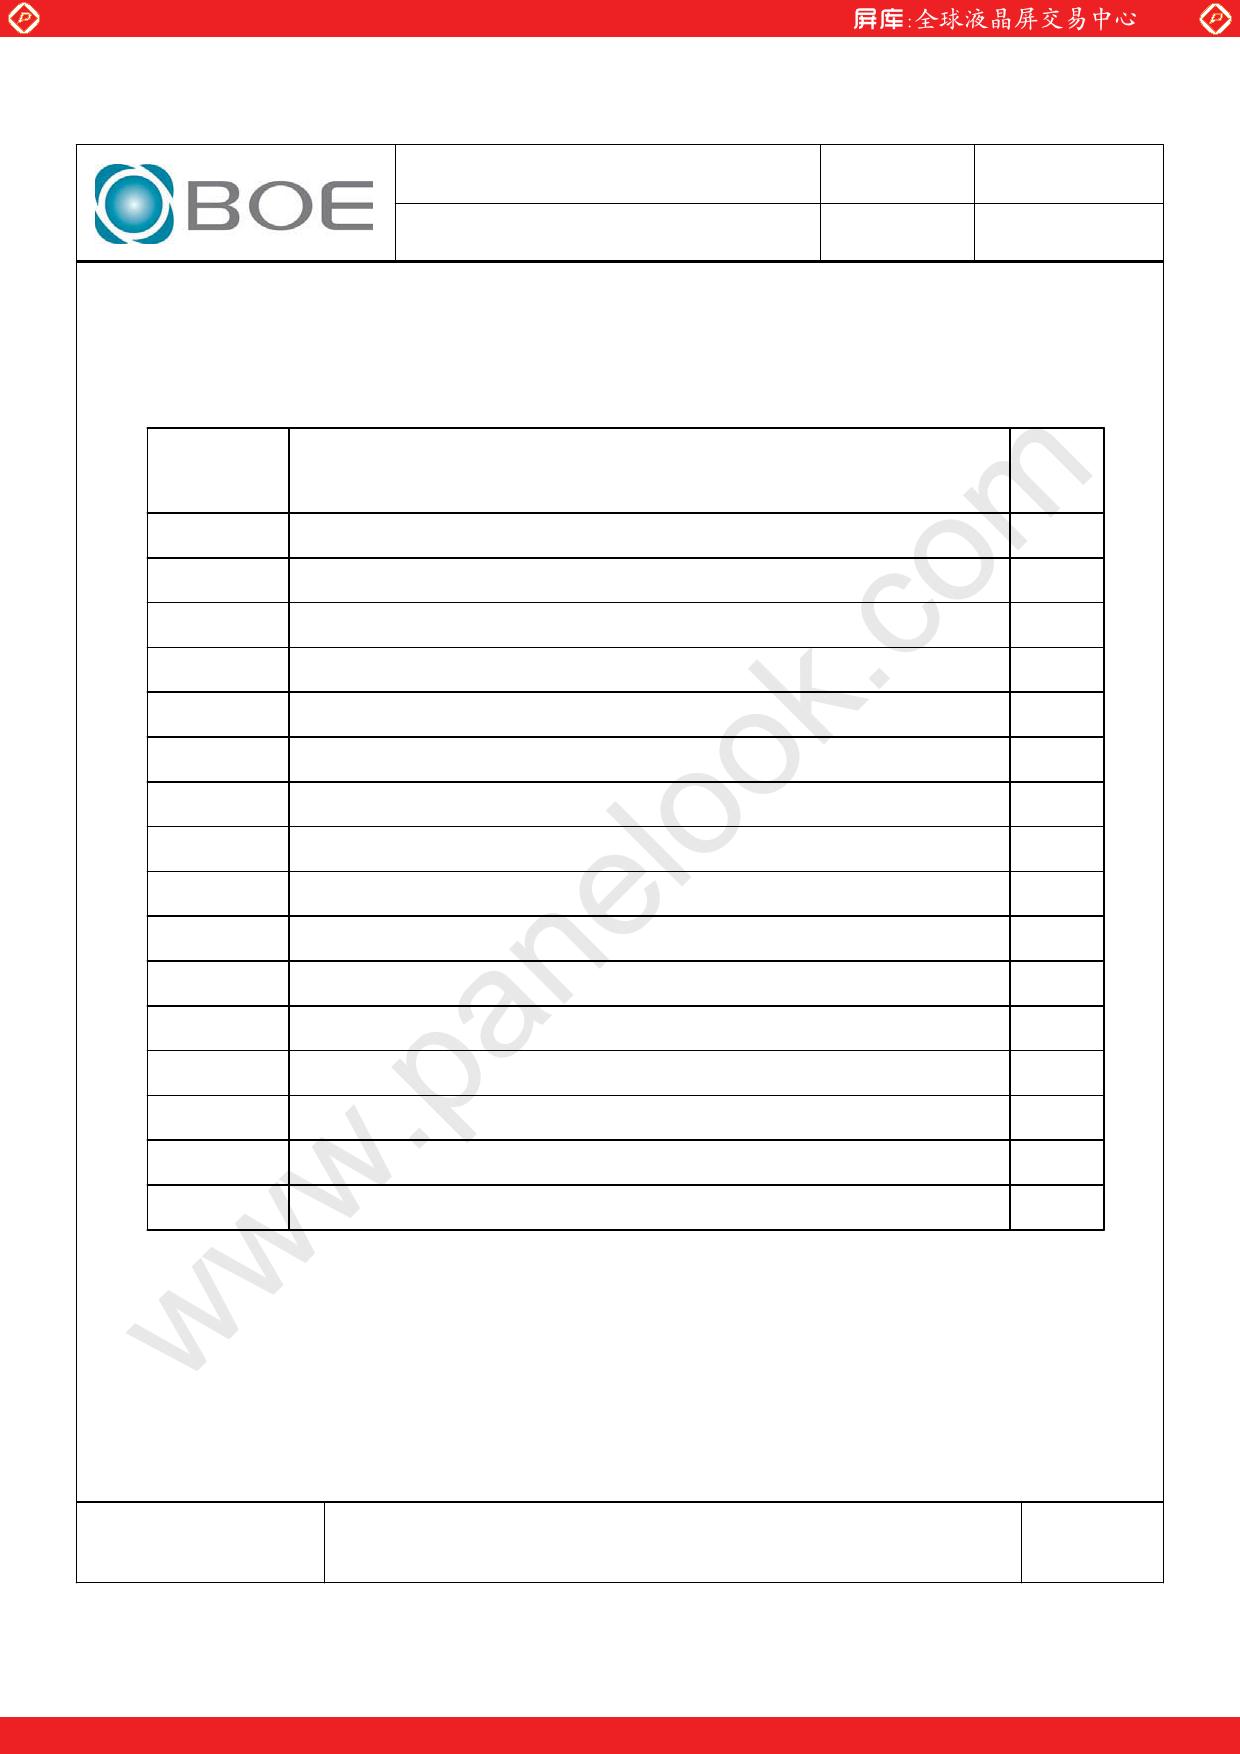 HV150UX1-102 pdf, ピン配列